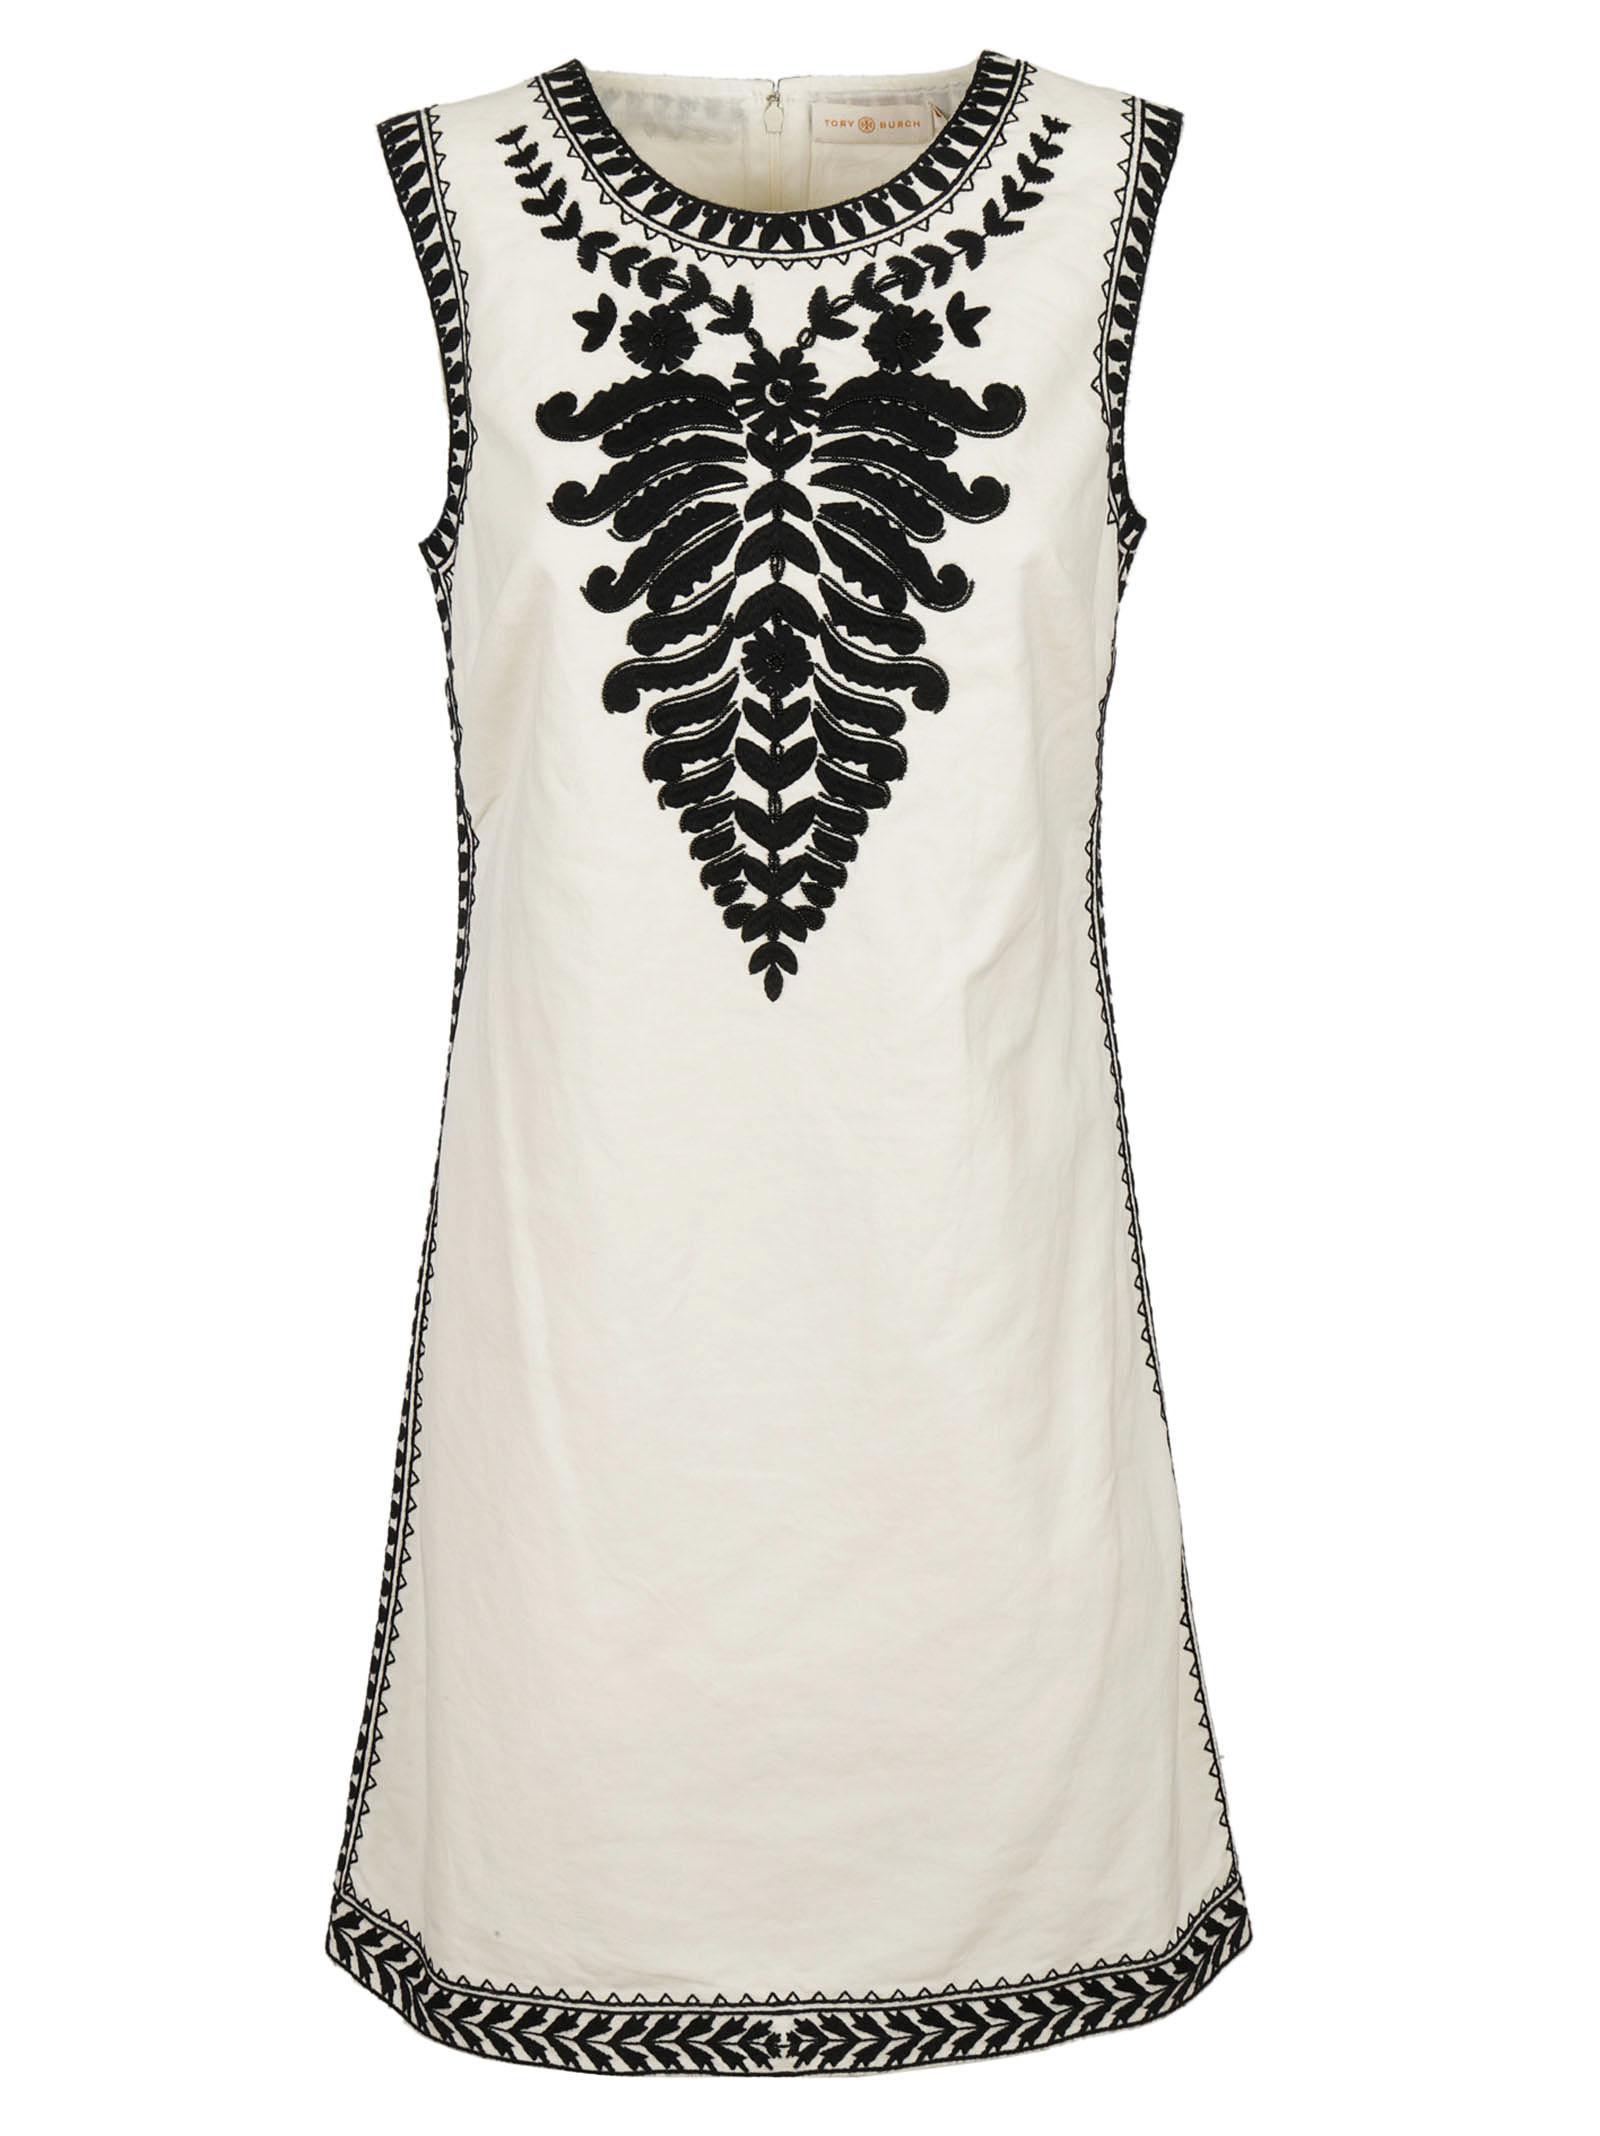 8cc542deb13 Tory Burch. Women s Embellished Sleeveless Dress